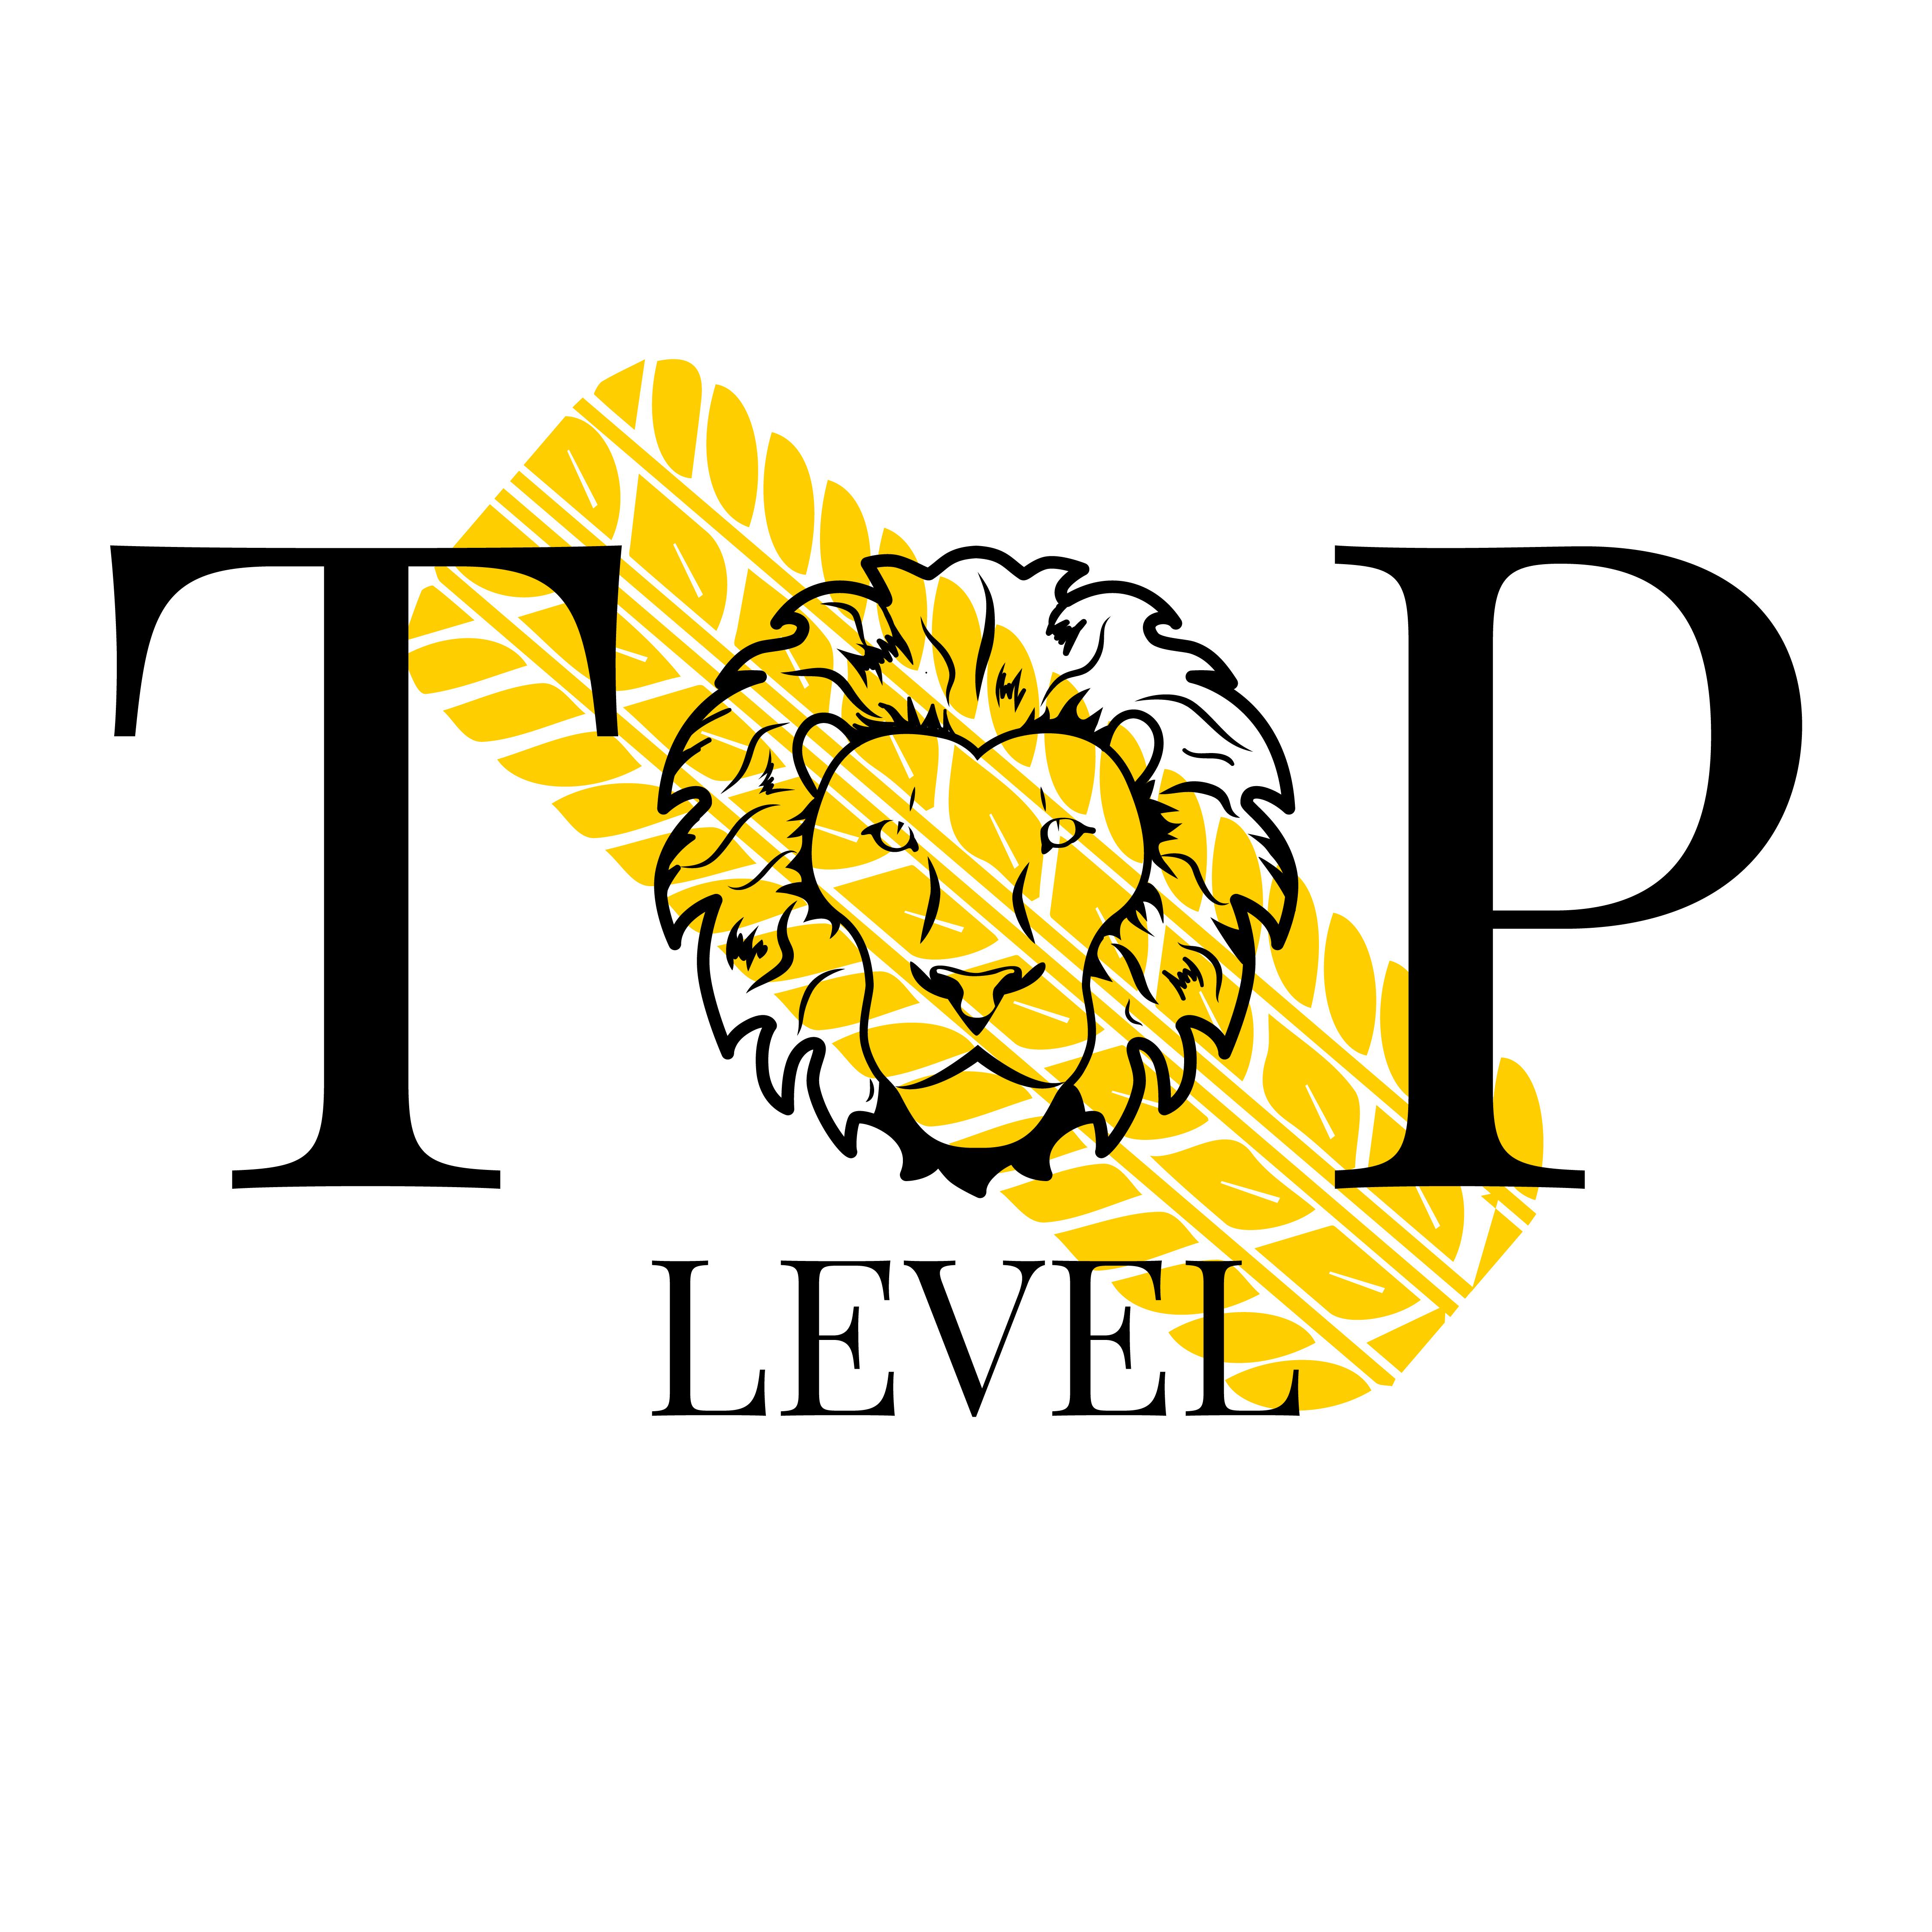 Разработка логотипа для тюнинг ателье фото f_8675f37644f65f3b.jpg